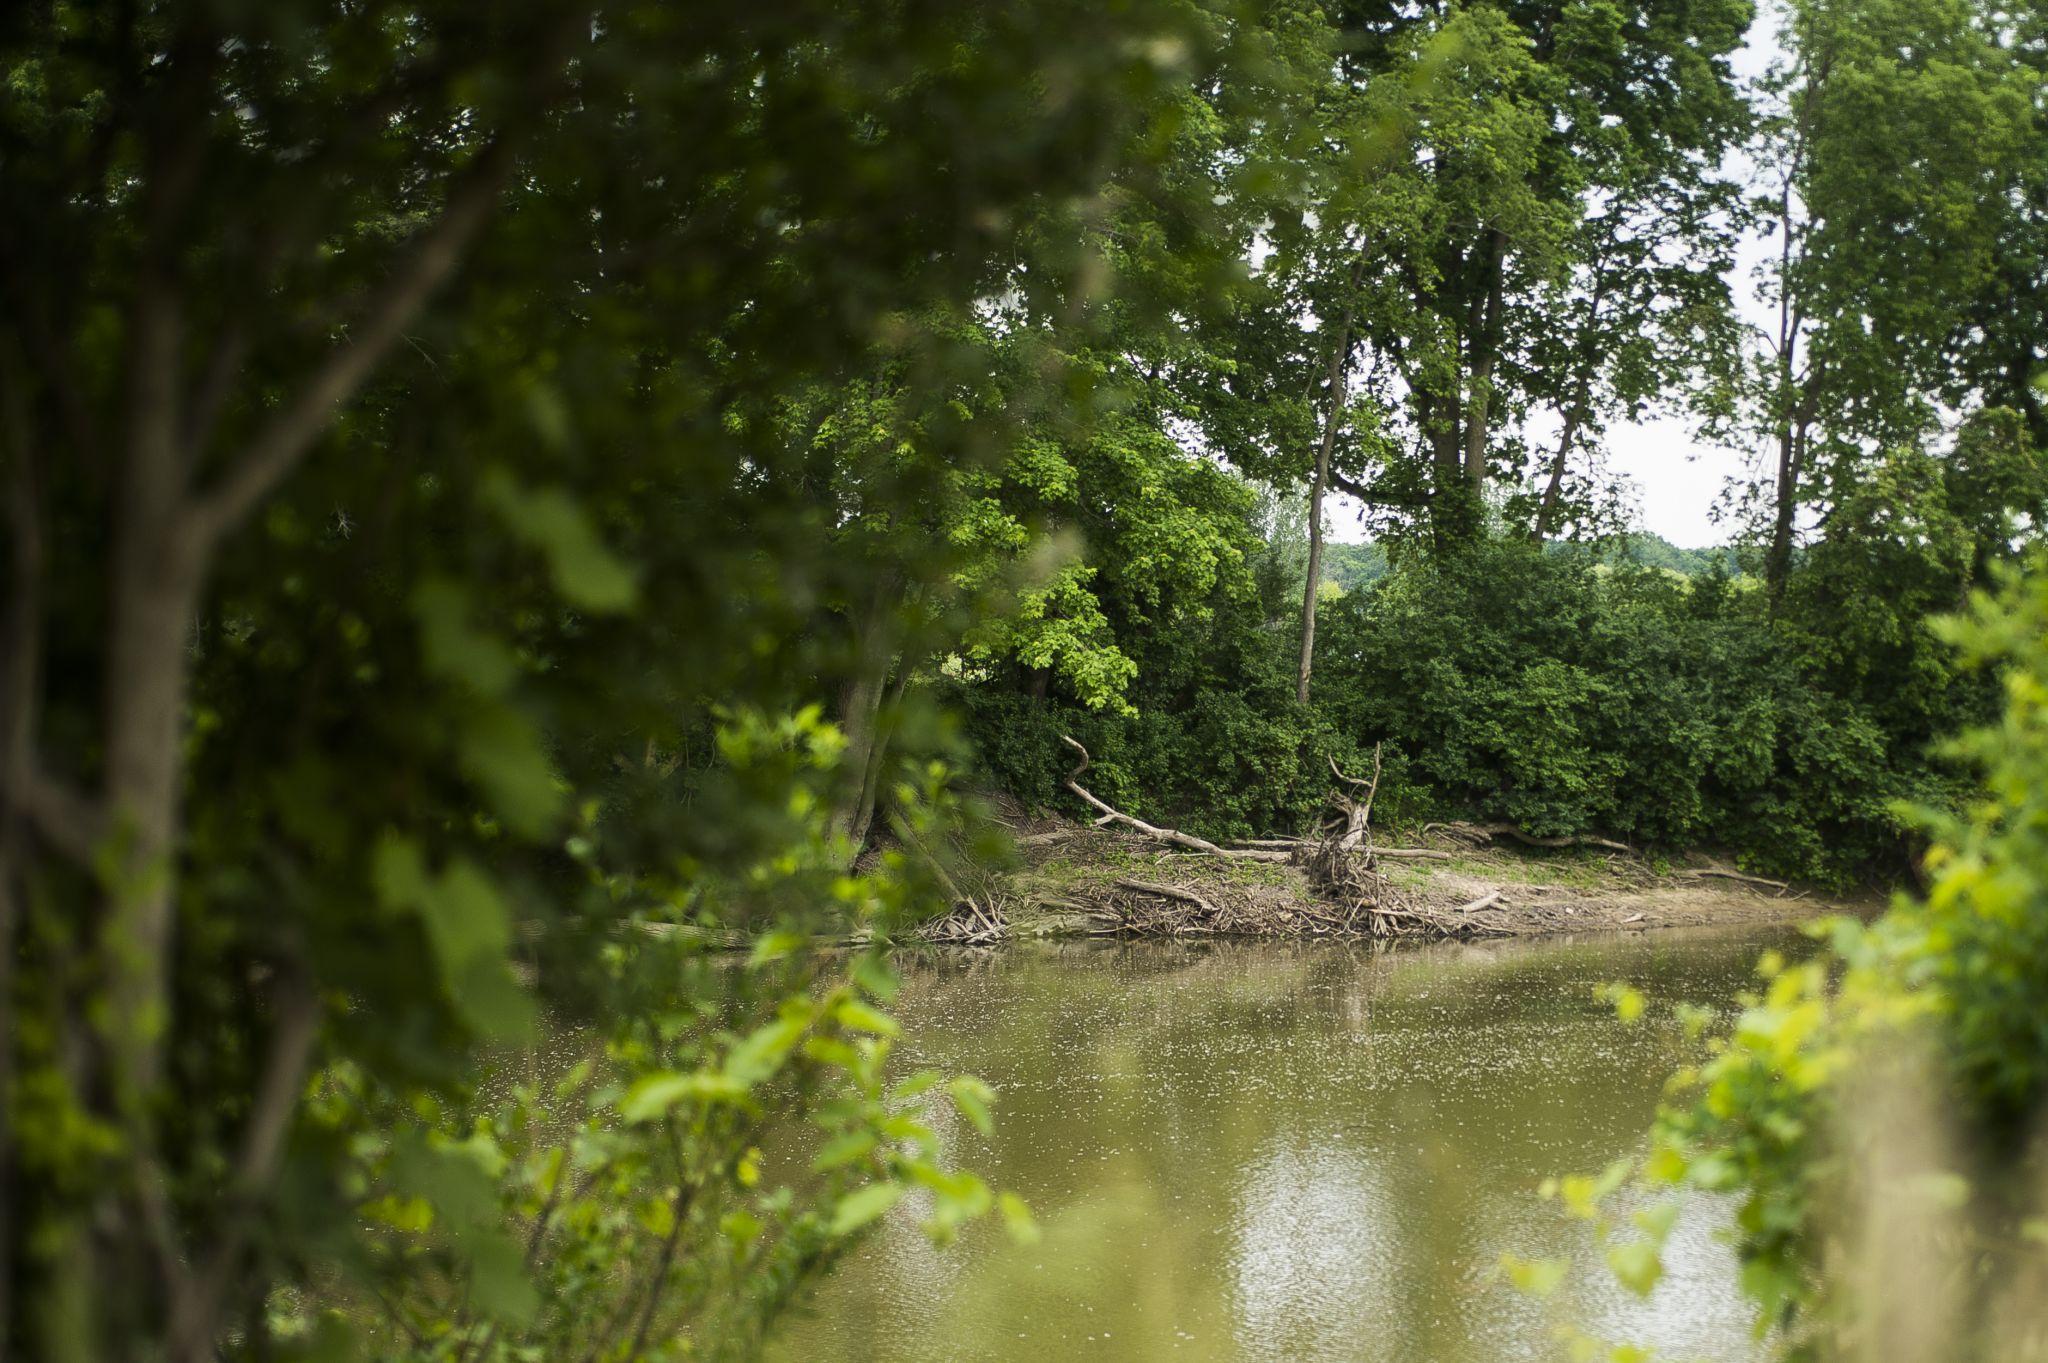 Man found in Tittabawassee River was Auburn lottery winner